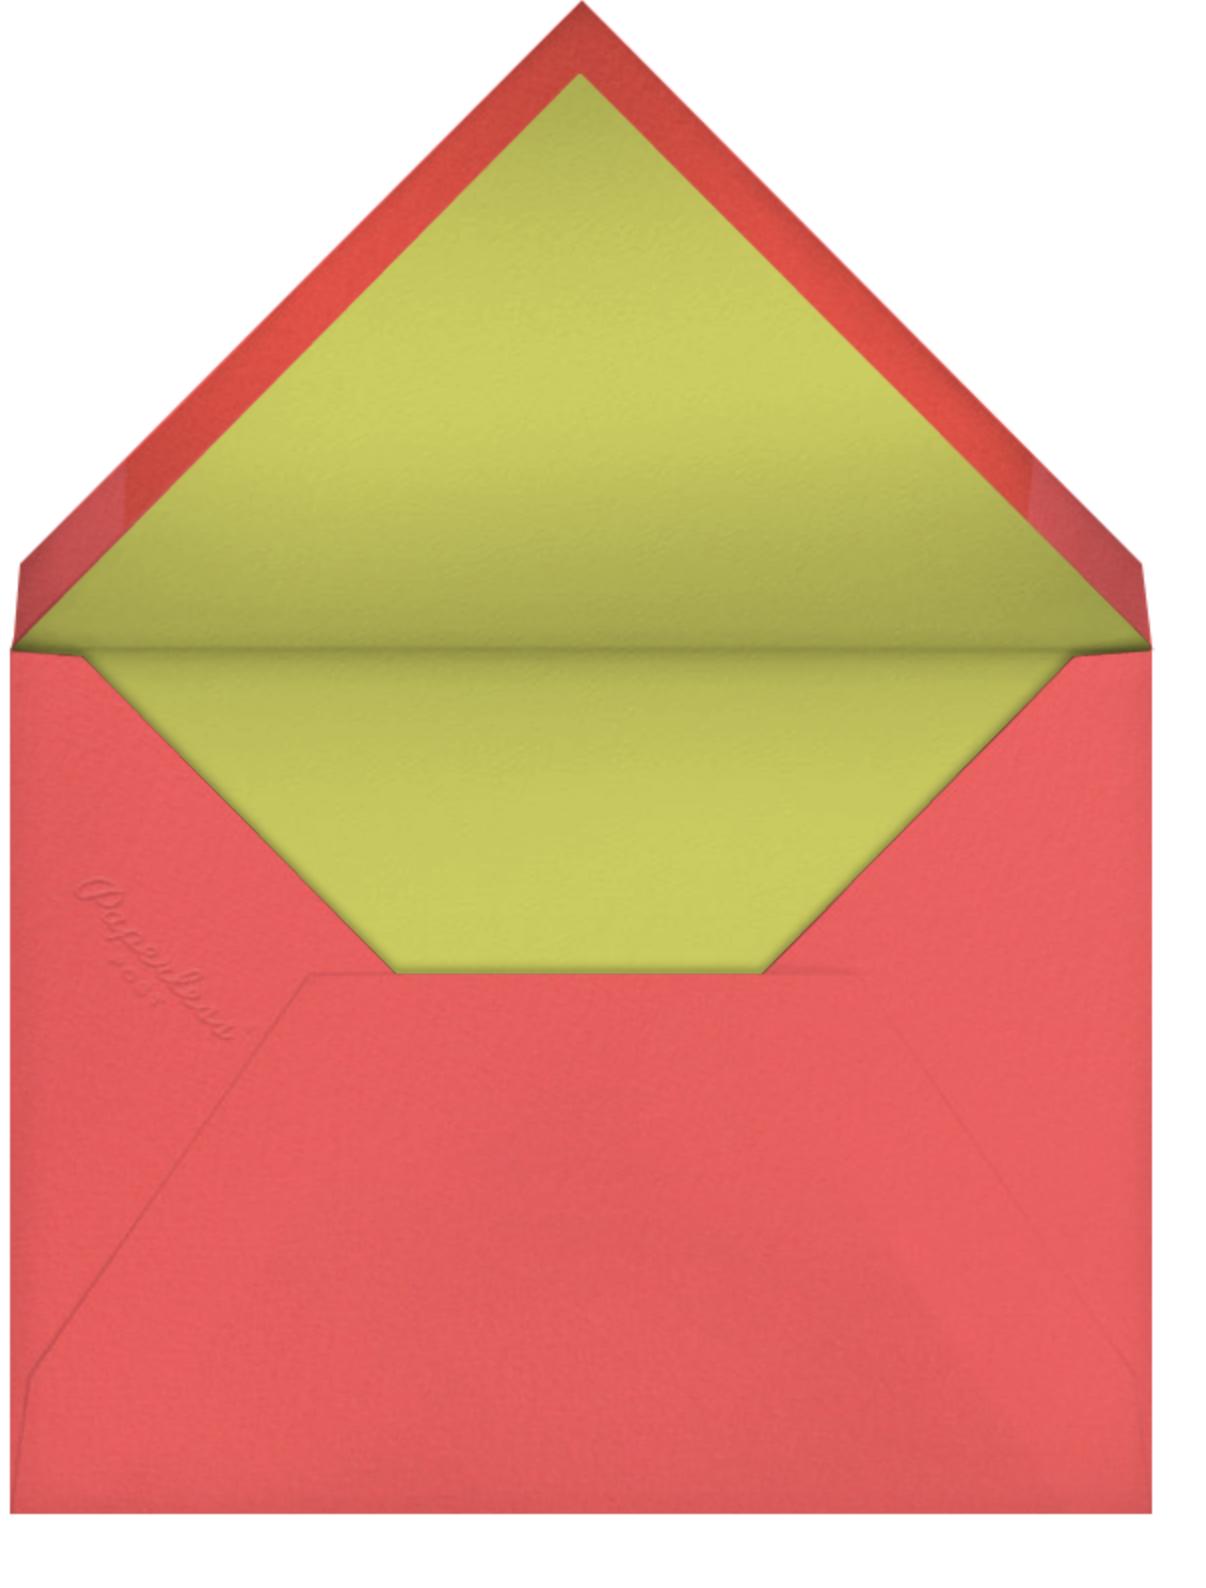 Princess Castle - Teal - Petit Collage - Kids' birthday - envelope back